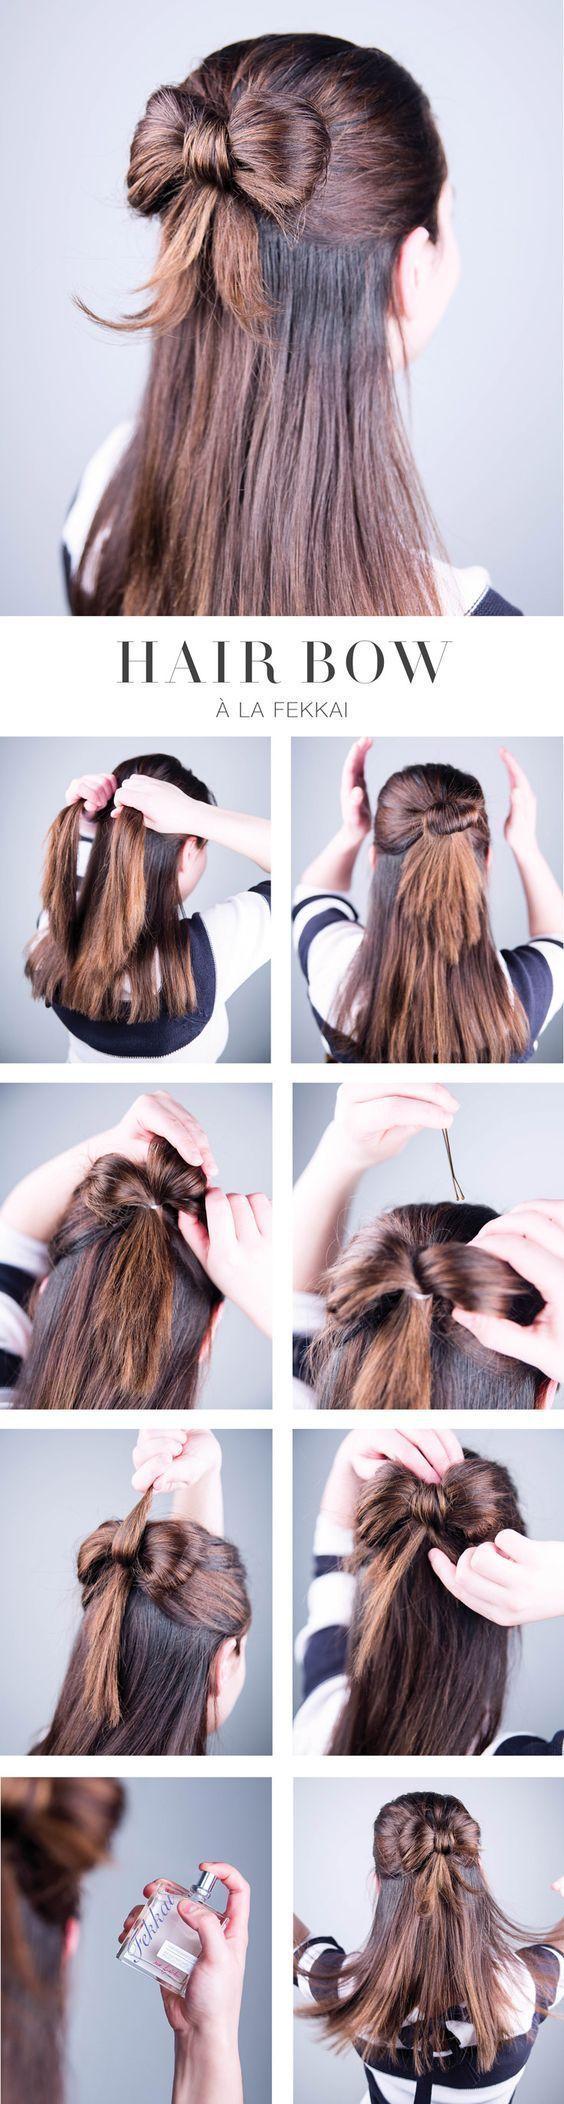 Hairstyle // Hair bow tutorial.